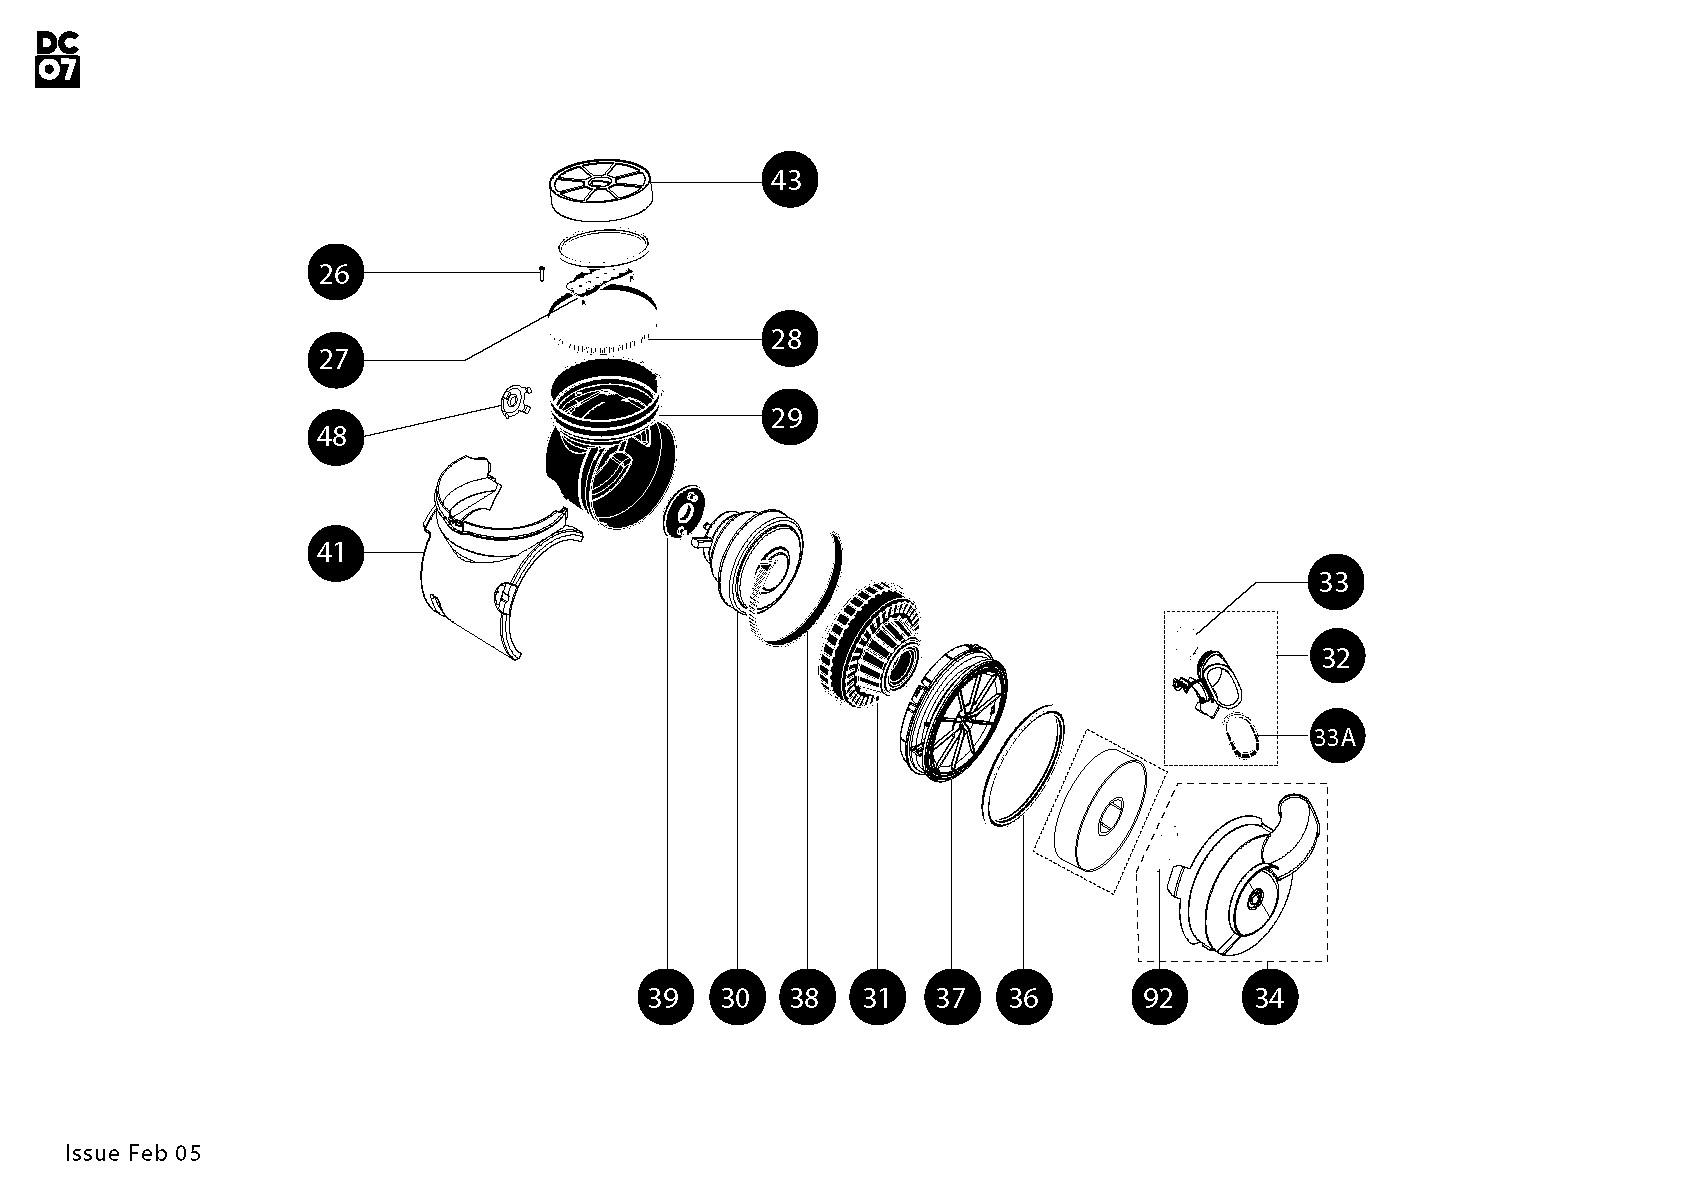 dyson dc14 parts diagram amazon think crucial replacement